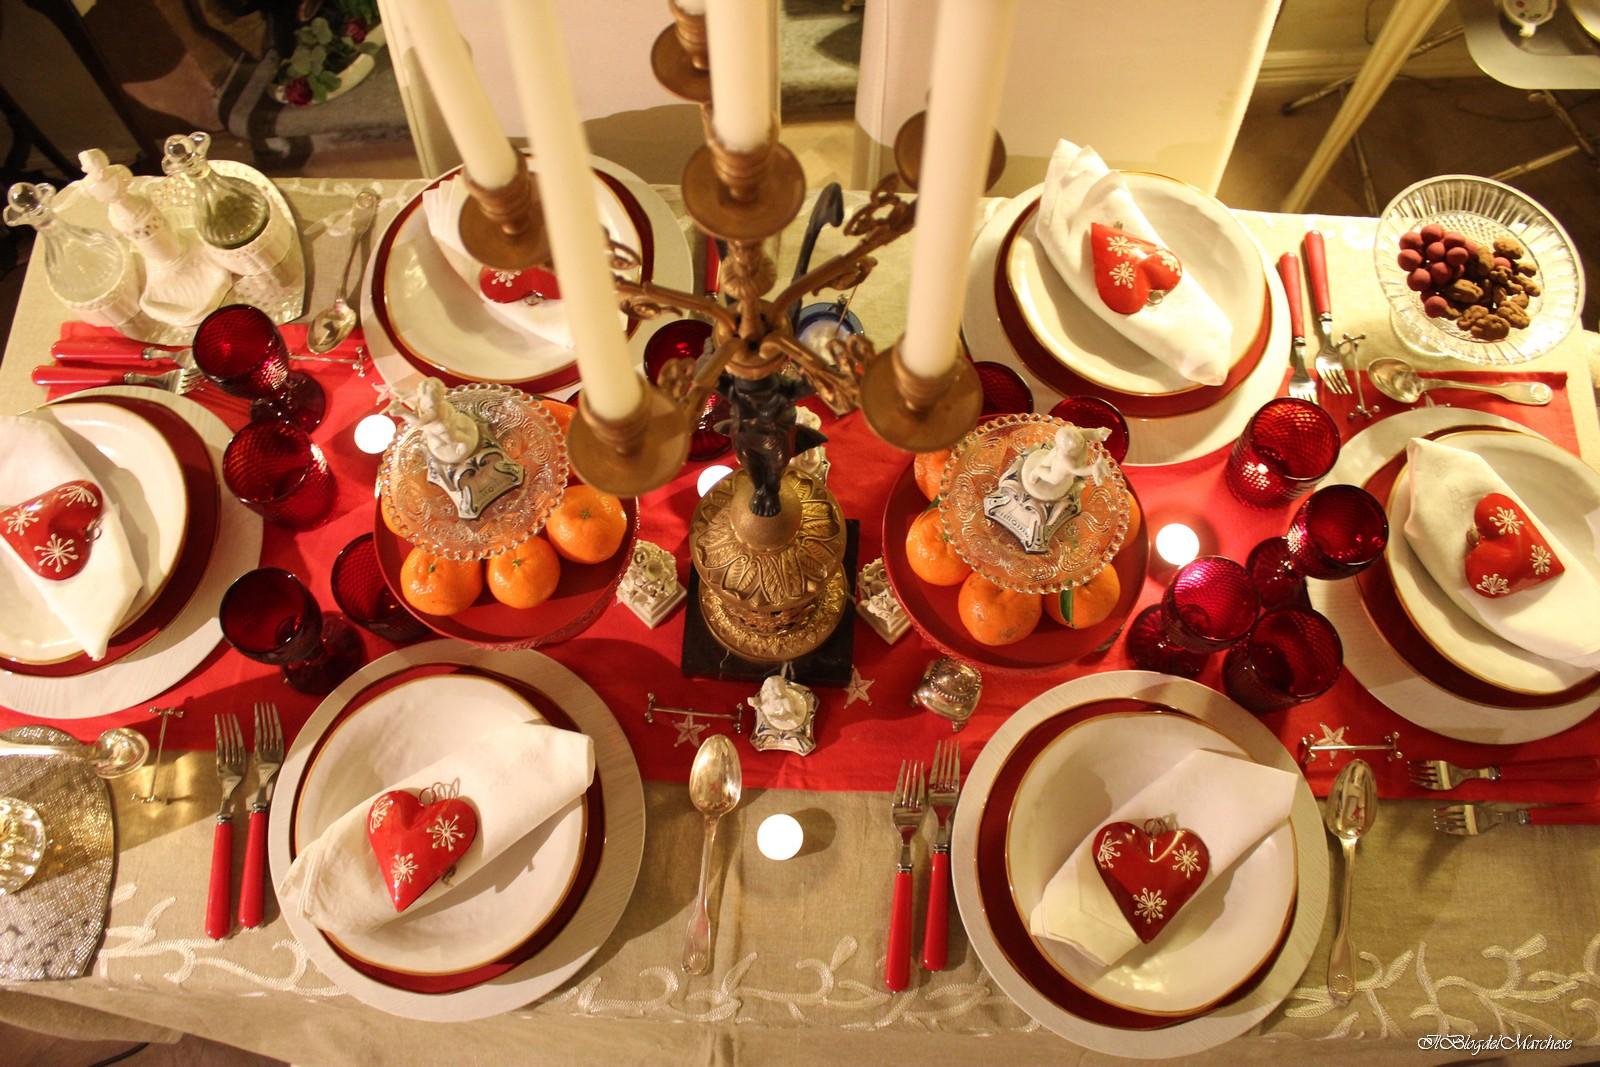 Tavola Per Natale Foto idee per addobbare la tavola di natale